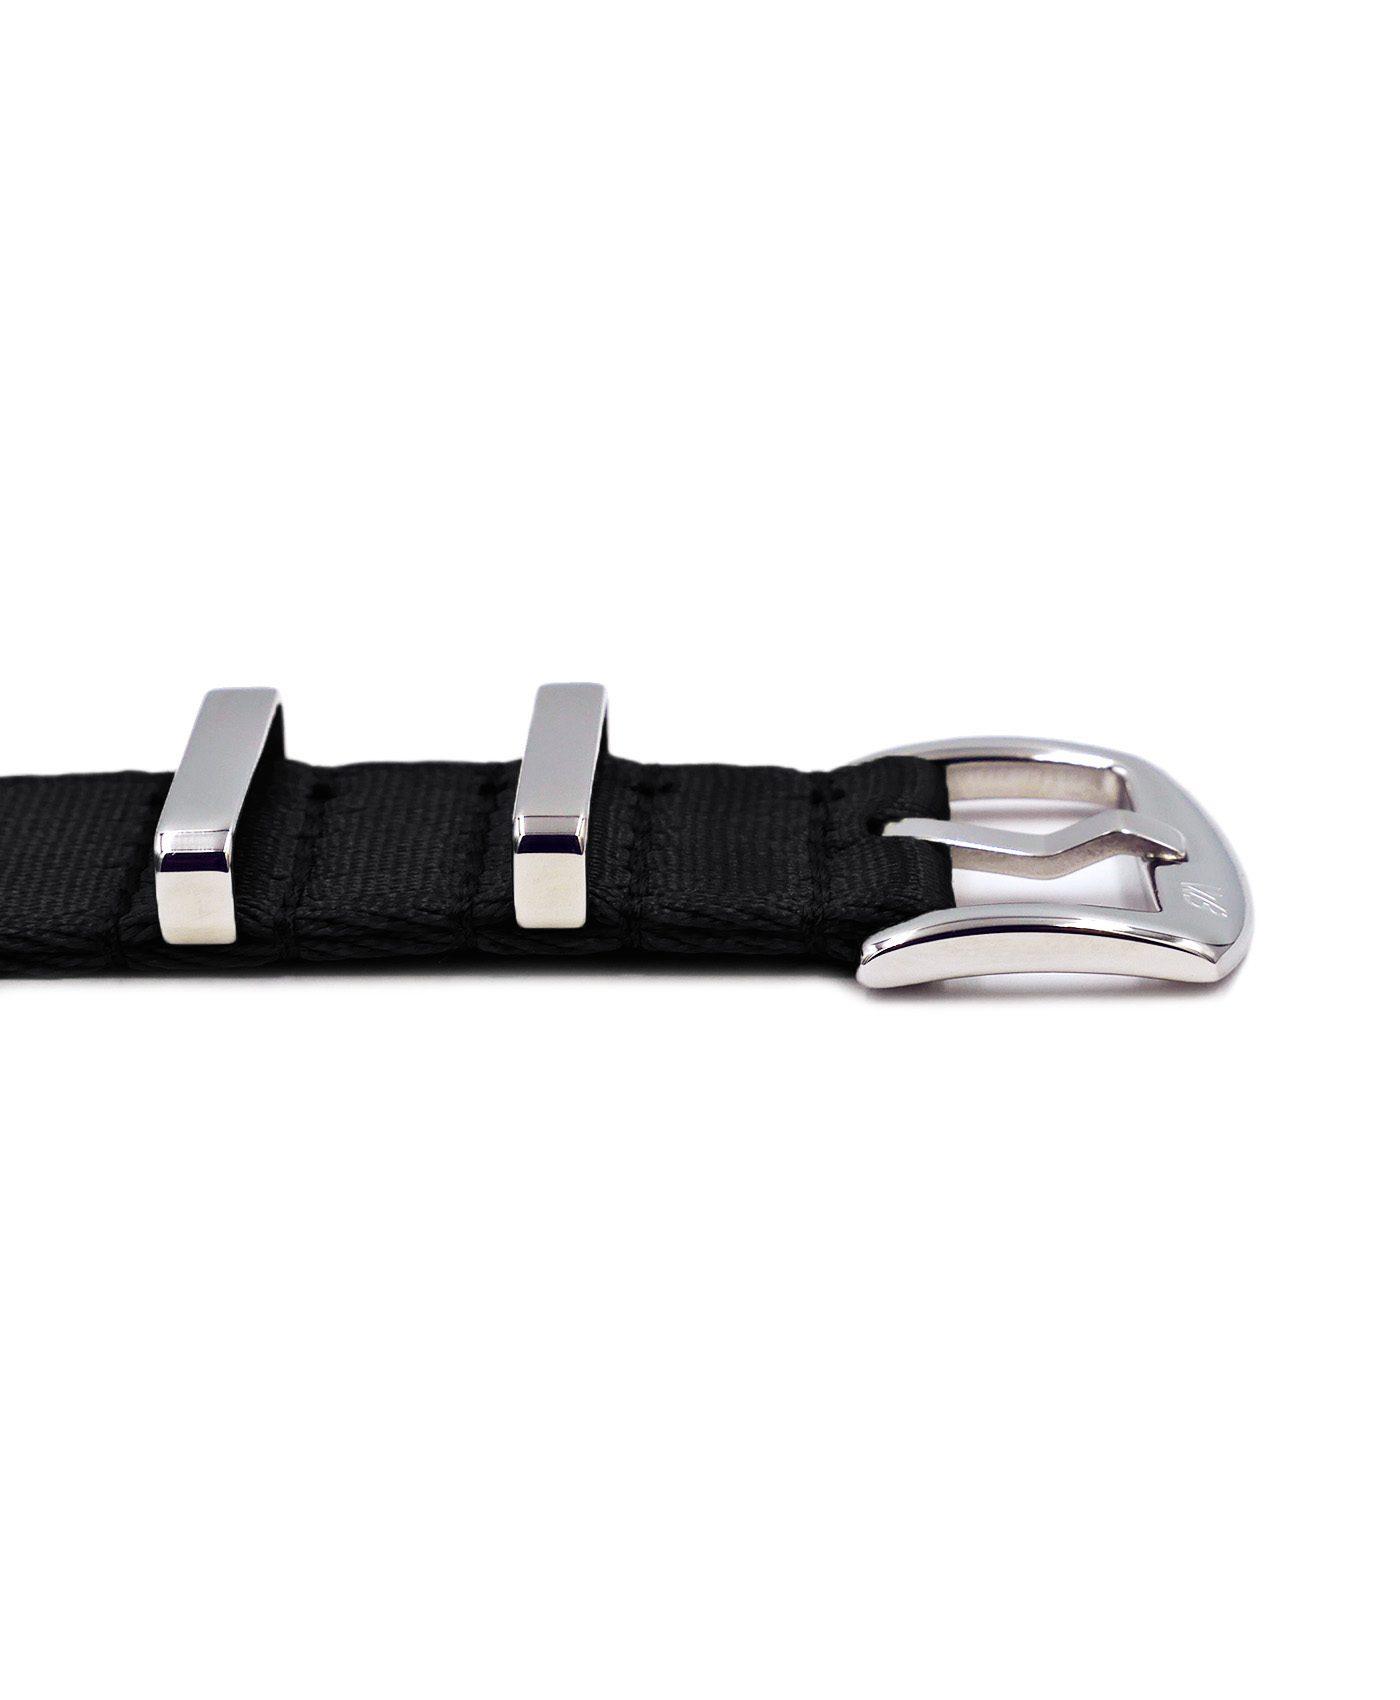 Premium 1.2 mm seat belt polished NATO Strap black buckle by WatchBandit